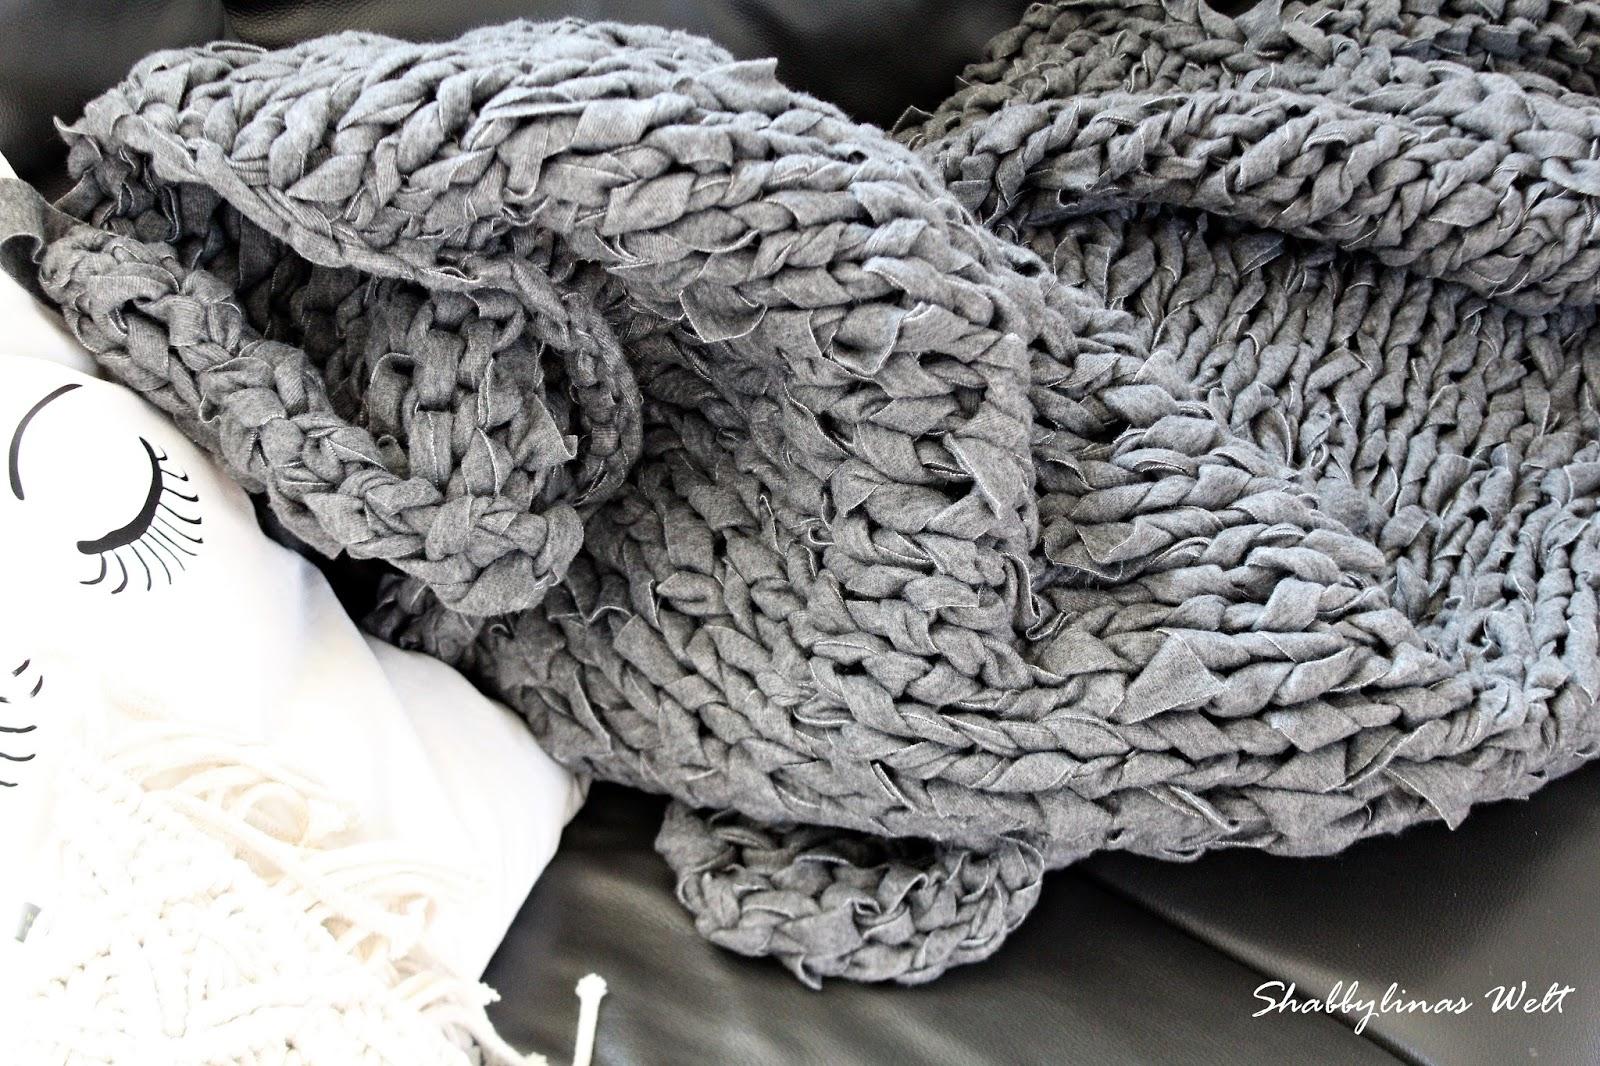 Shabbylinas Welt .....wie es mir gefällt: Chunky Knit - XXL Decke ...